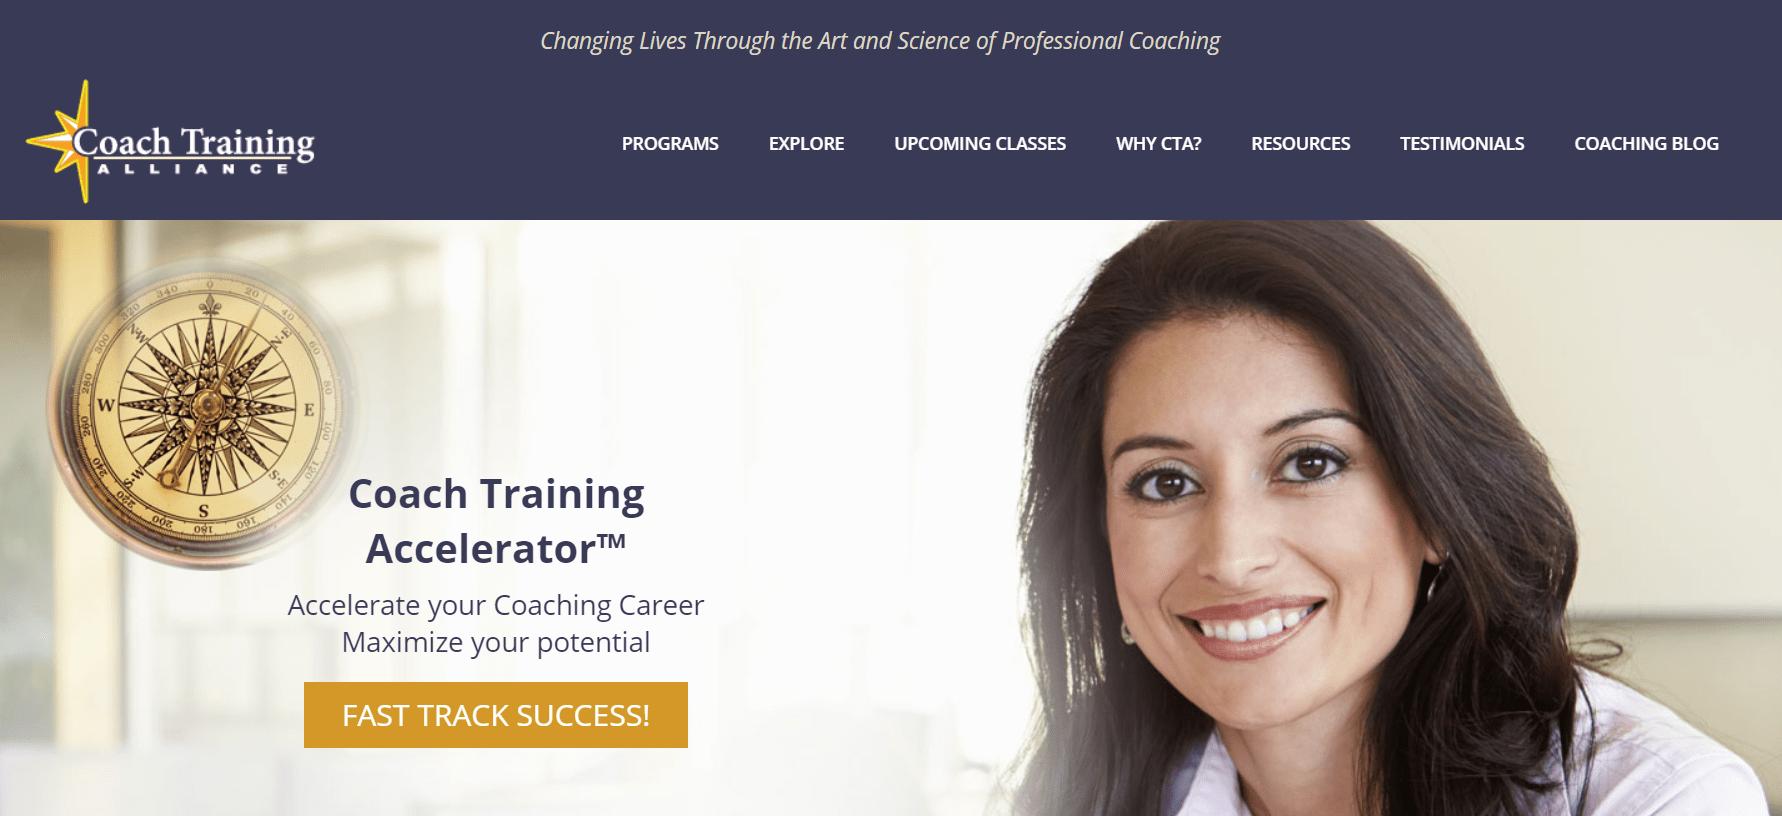 Coach Training Alliance Review- Life Coaching Courses